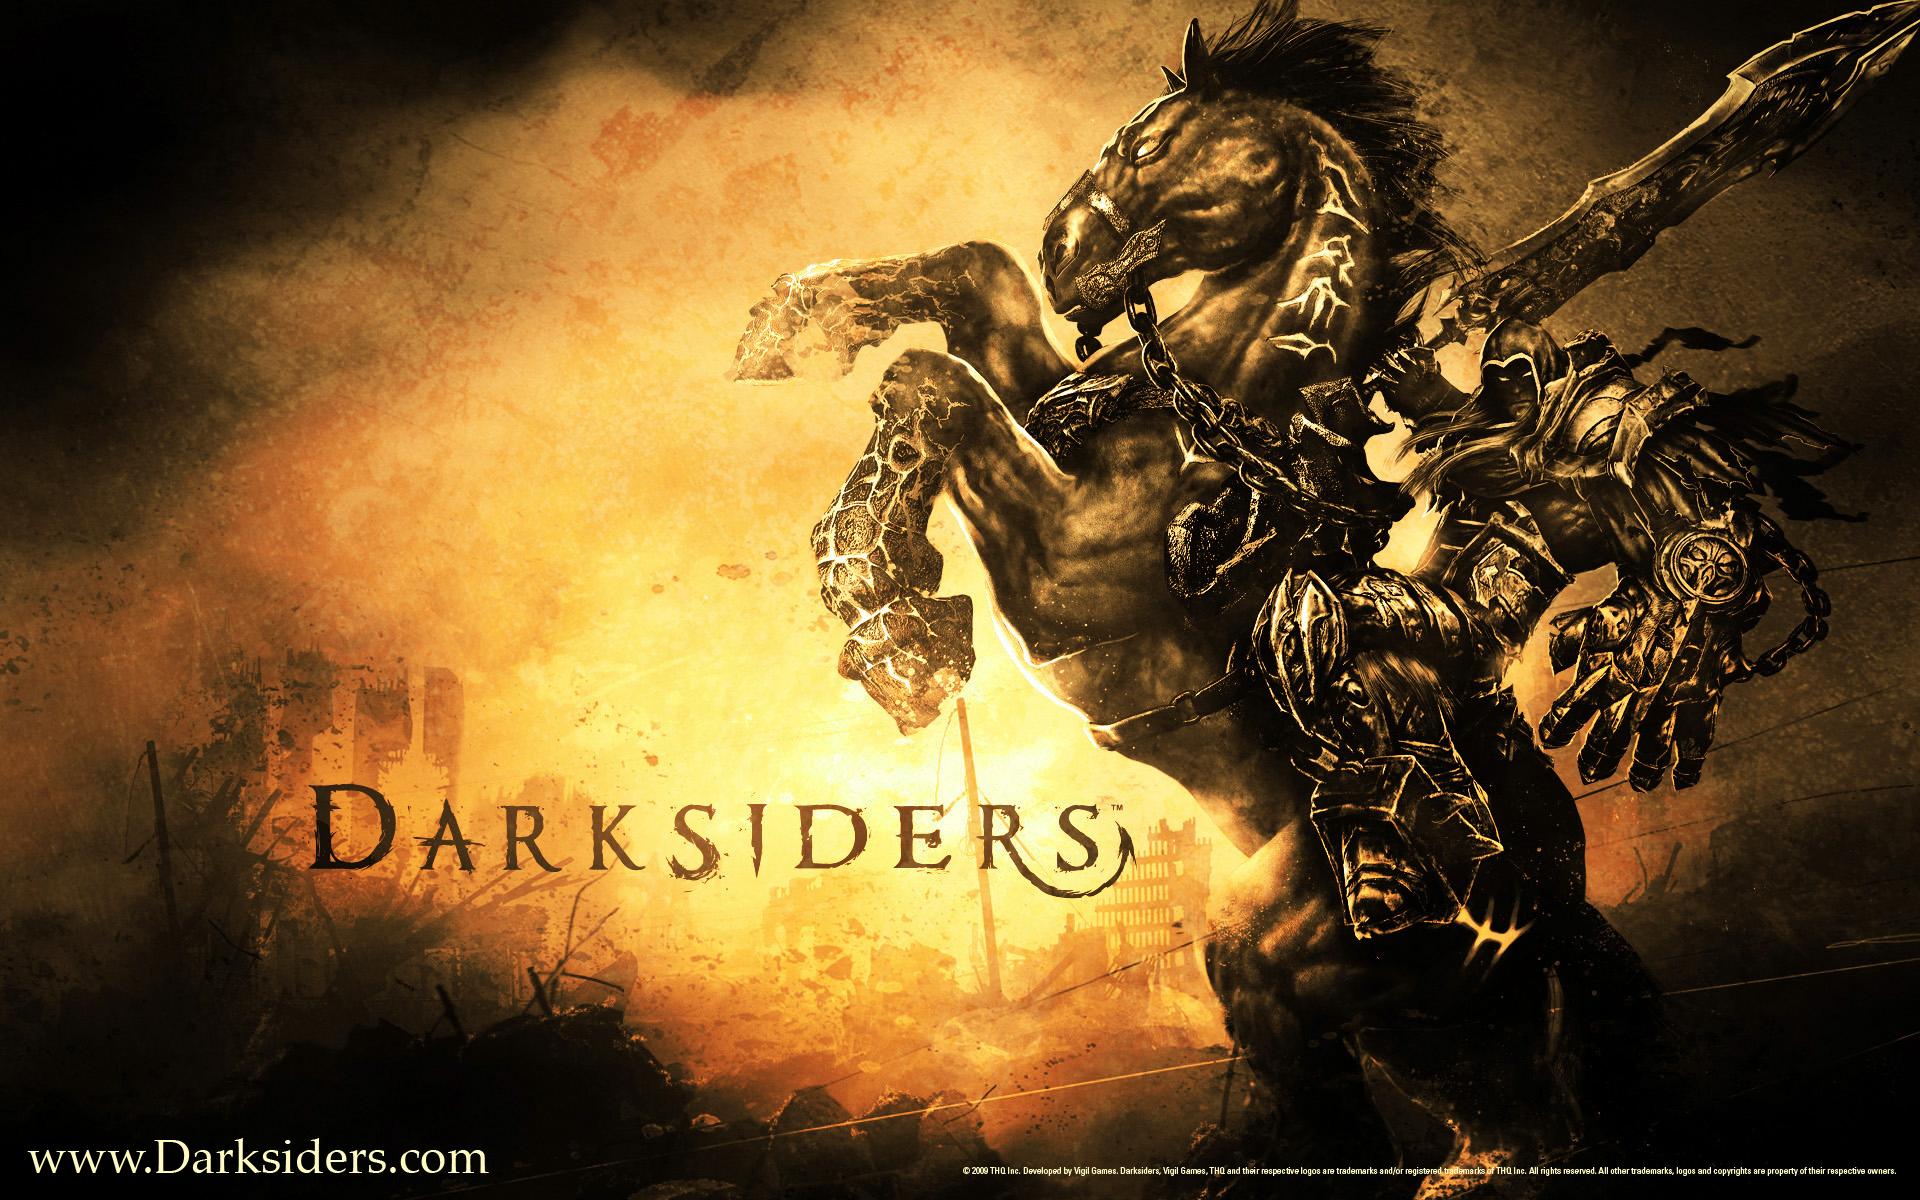 horsemen apocalypse darksiders darksiders 4 horsemen names four horses 1920x1200